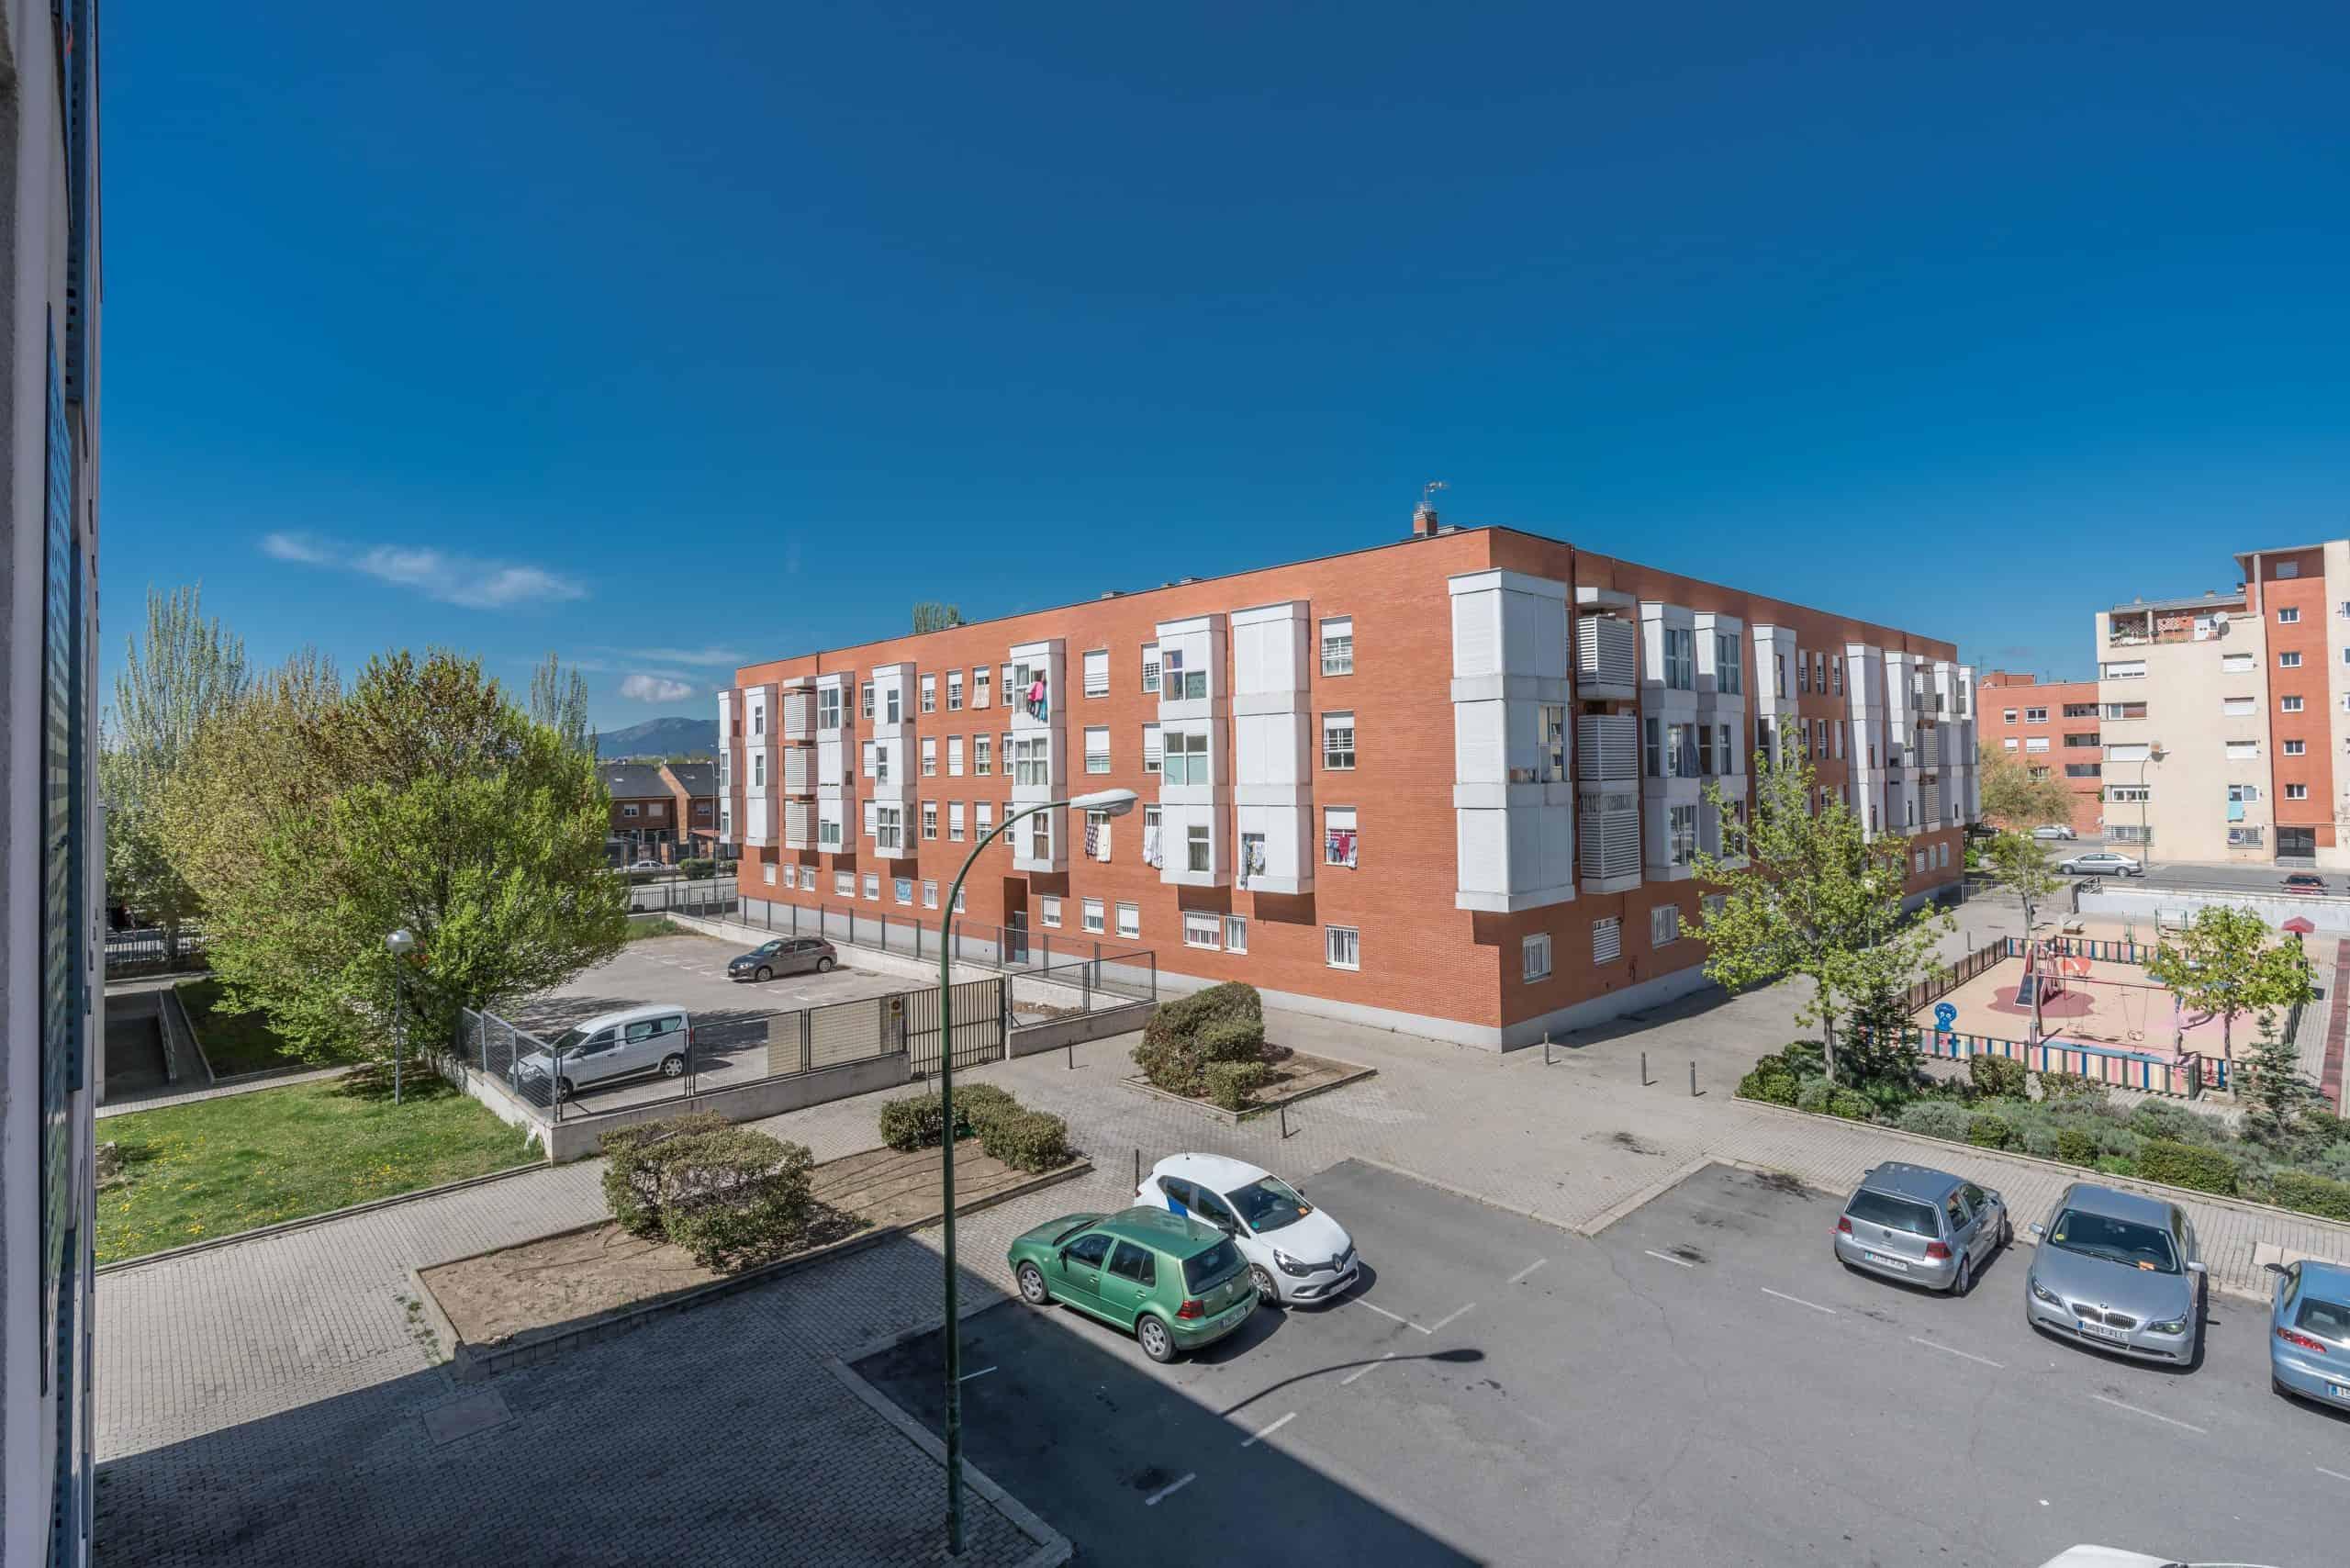 Agencia Inmobiliaria de Madrid-FUTUROCASA-Zona ARGANZUELA-EMBAJADORES-LEGAZPI -calle RincondelasHeras- Vistass